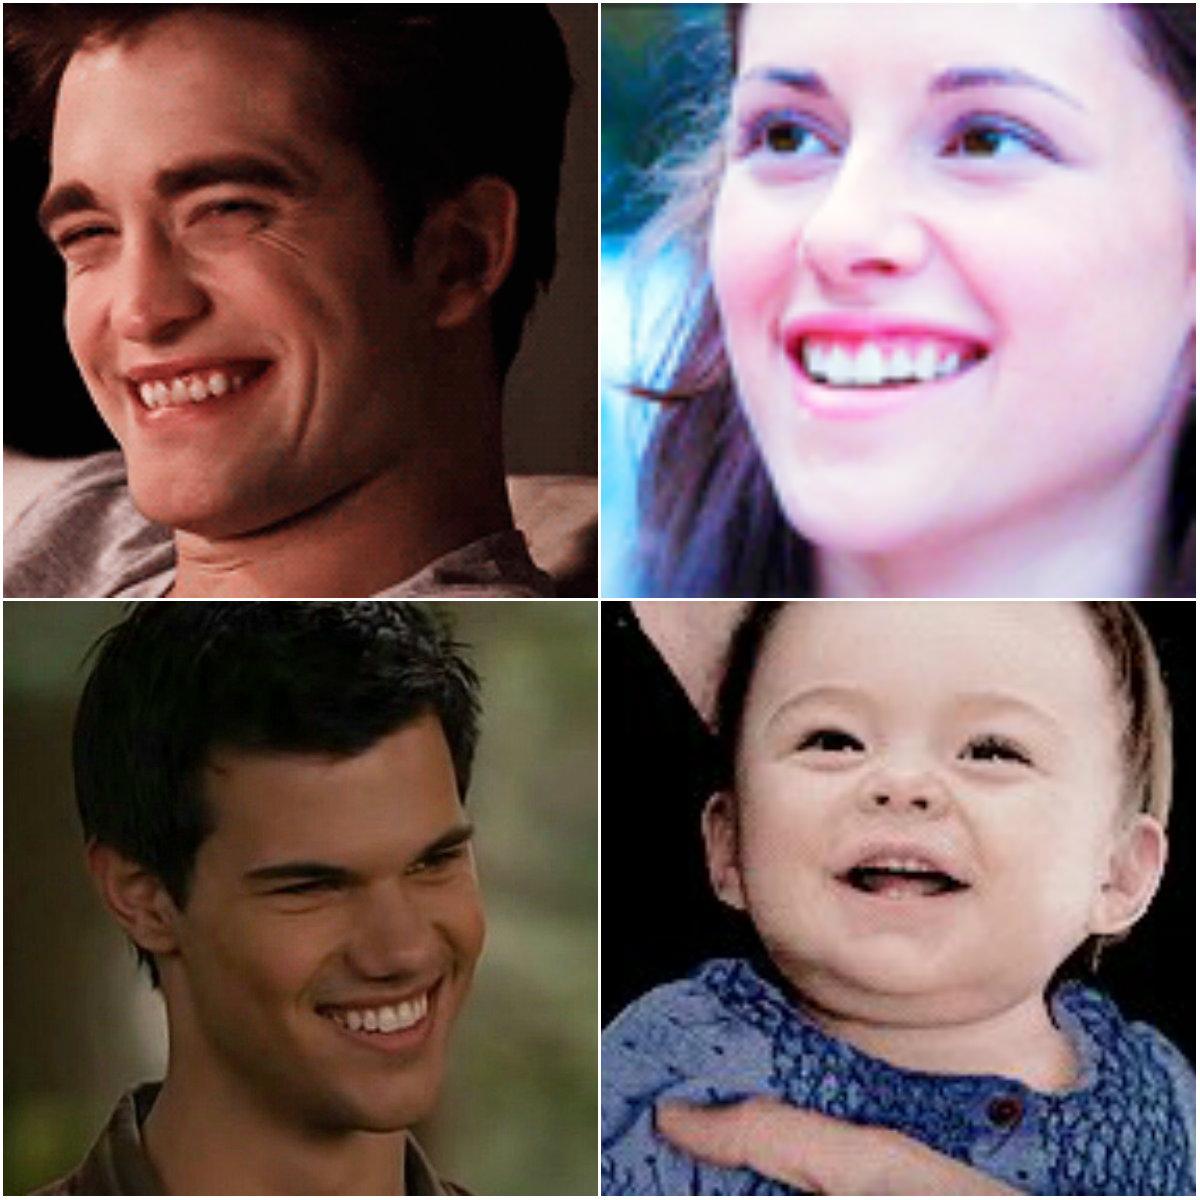 Edward, Bella, Jacob, and Renesmee